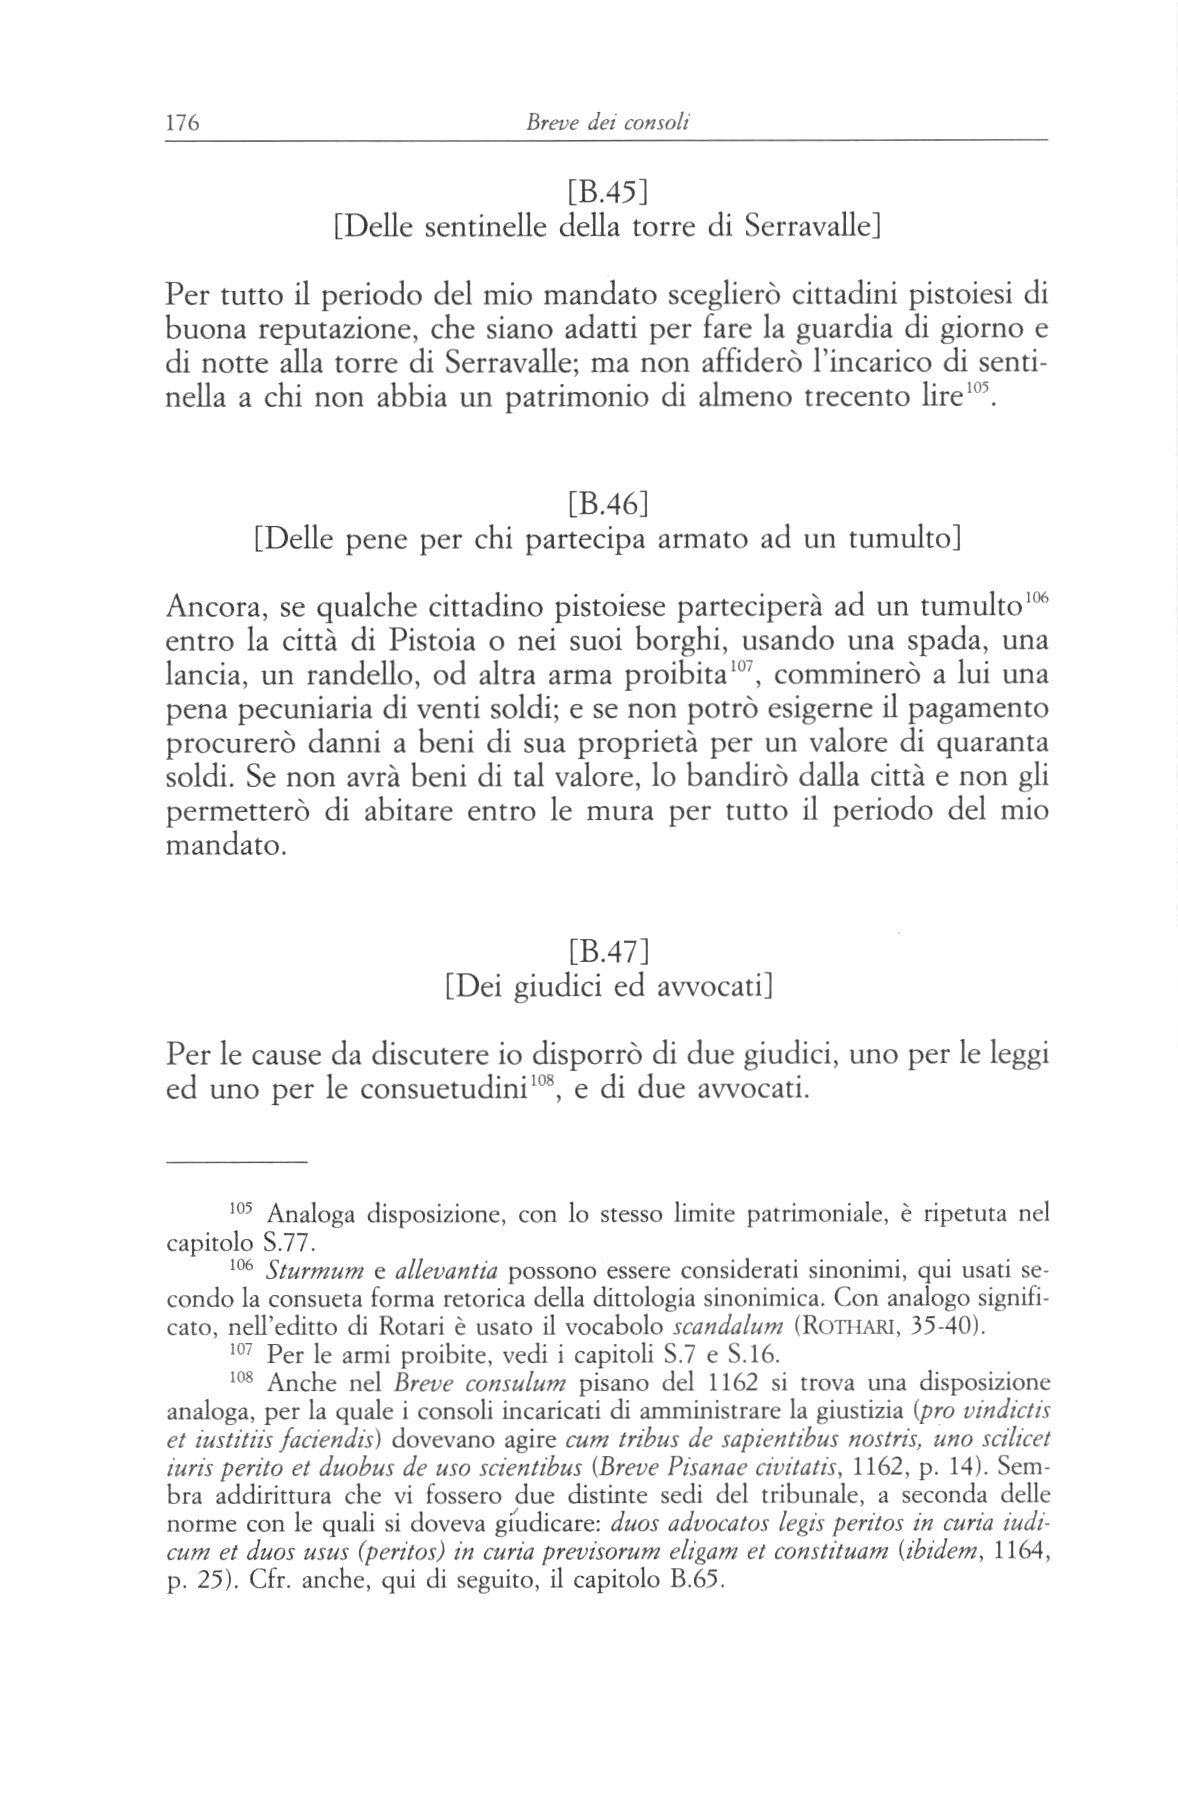 statuti pistoiesi del sec.XII 0176.jpg